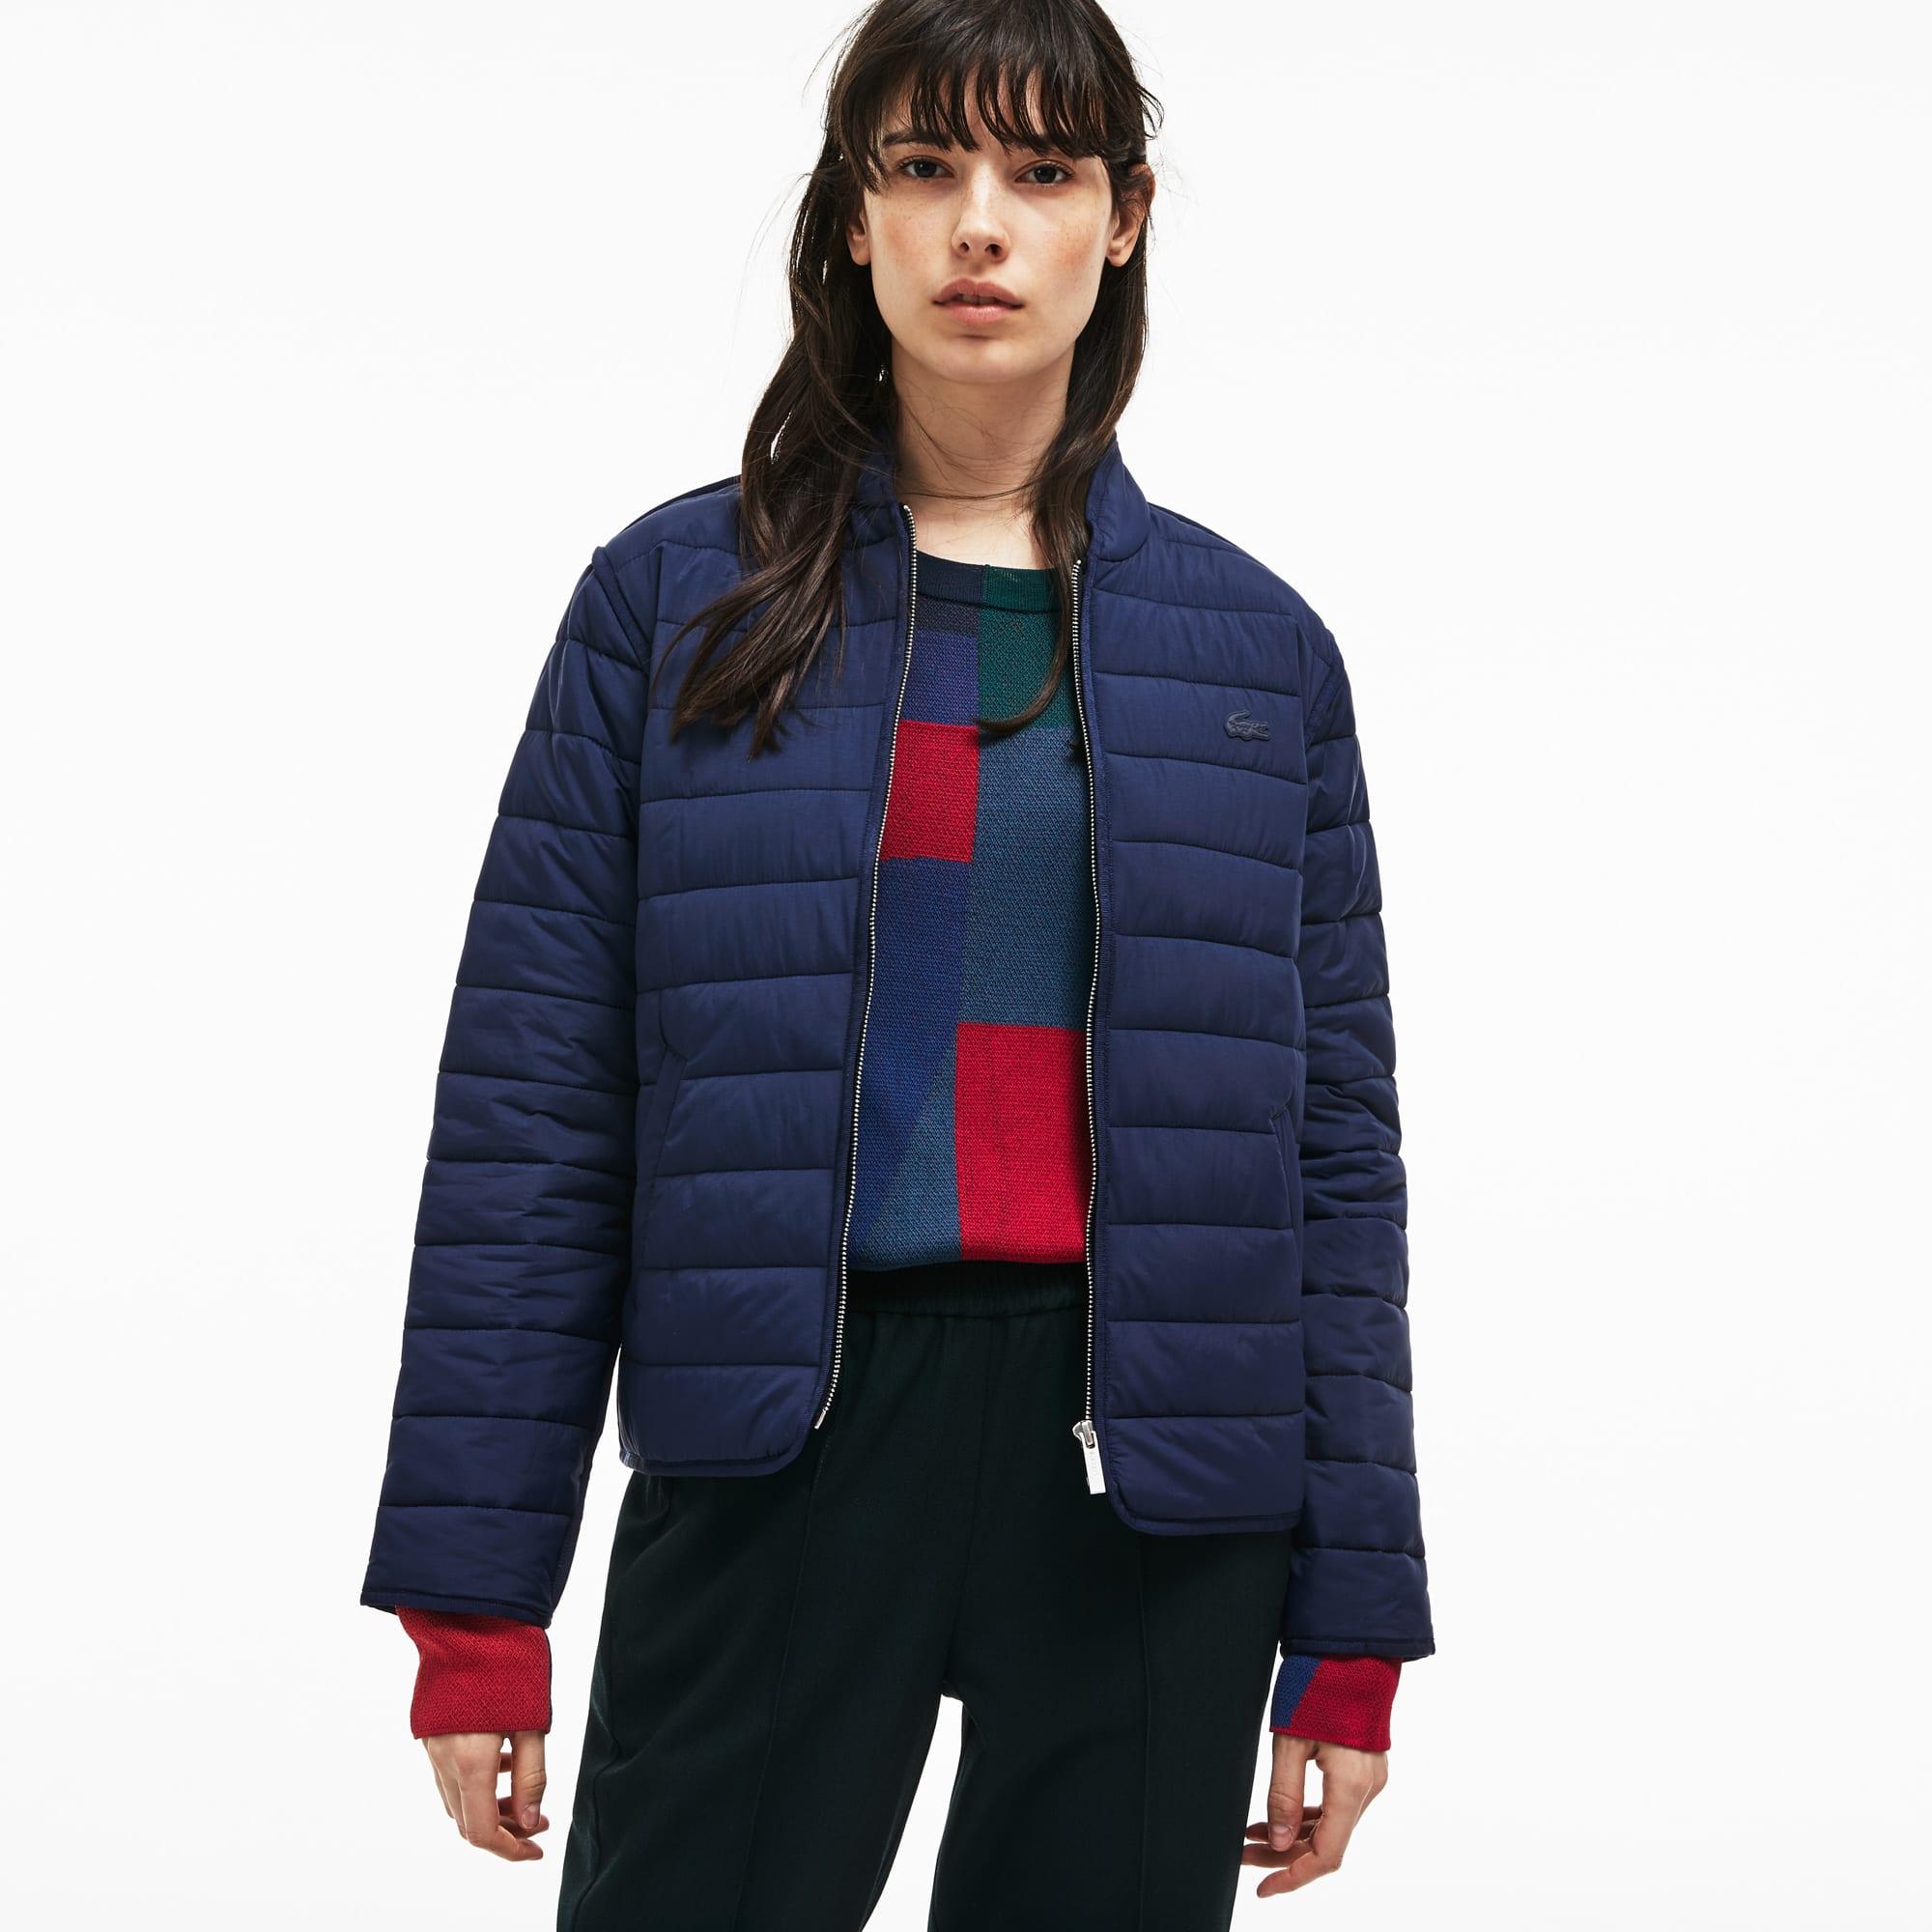 dc3893dbd24 Down jacket feminina com zíper em tafetá